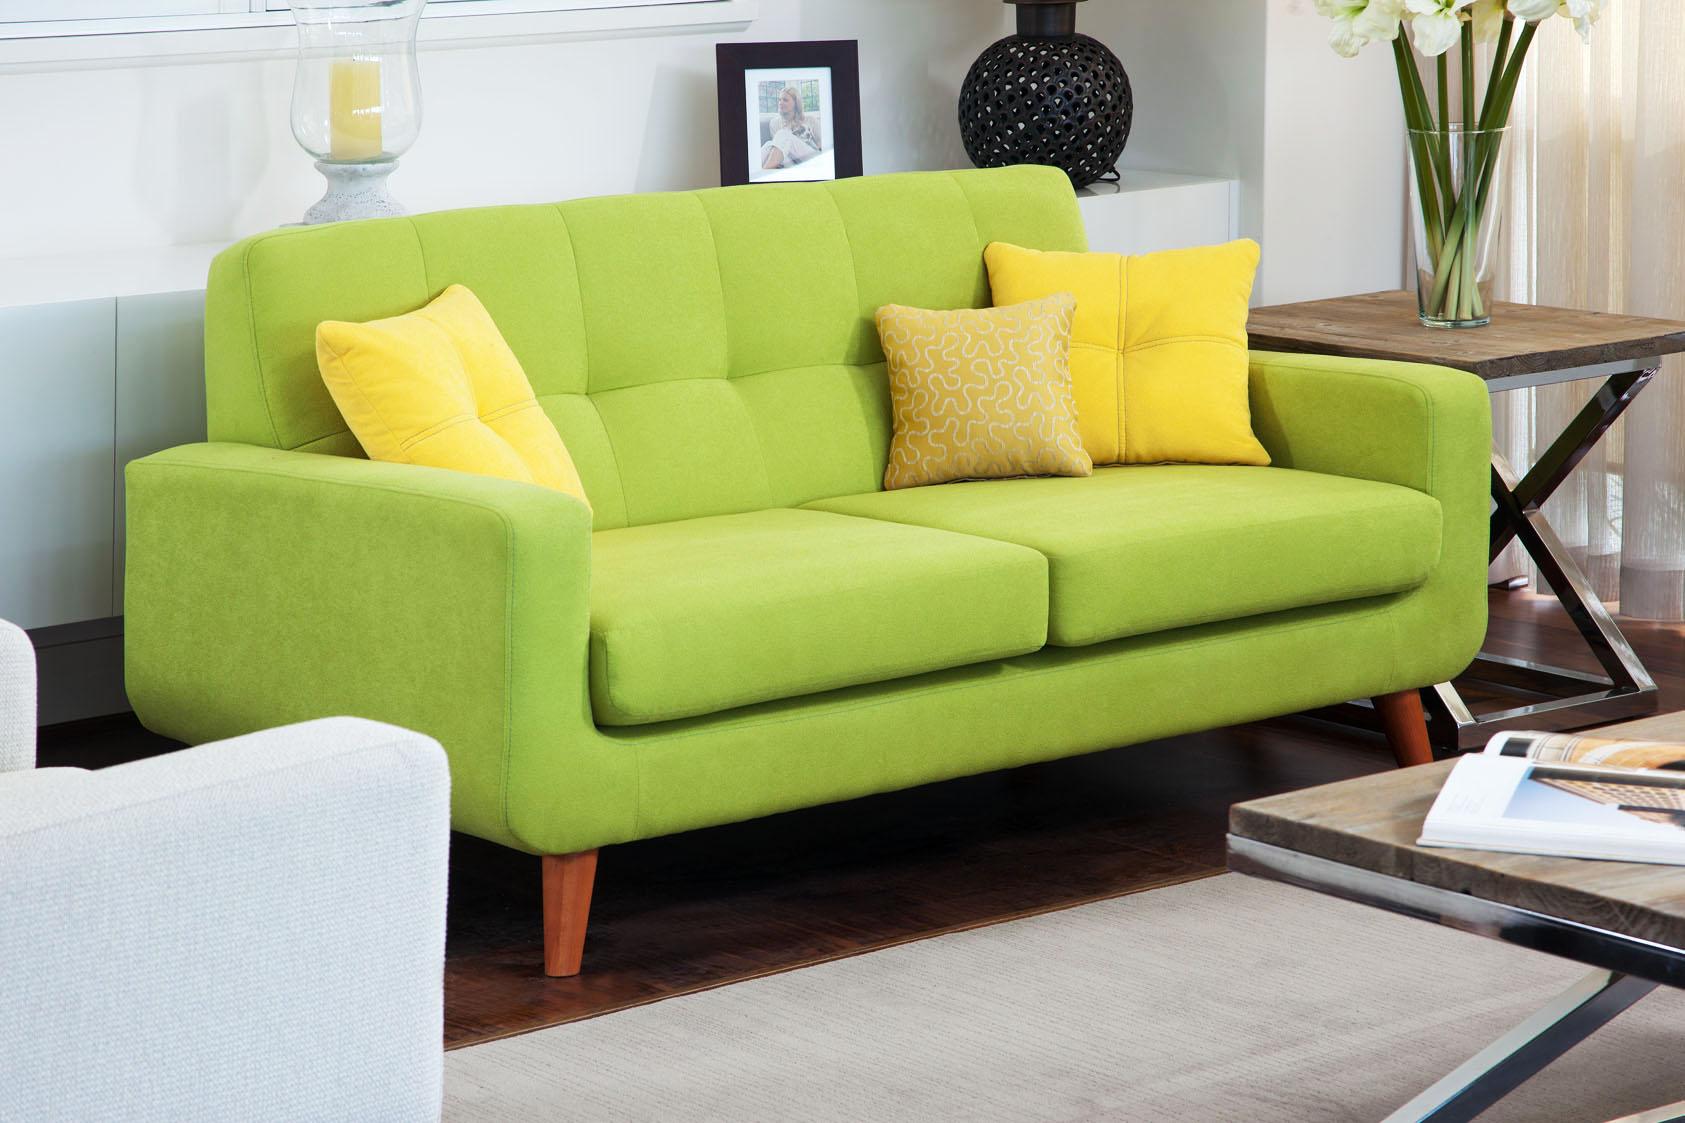 Alpine Sofa Design And Manufacture Perth Torrance And